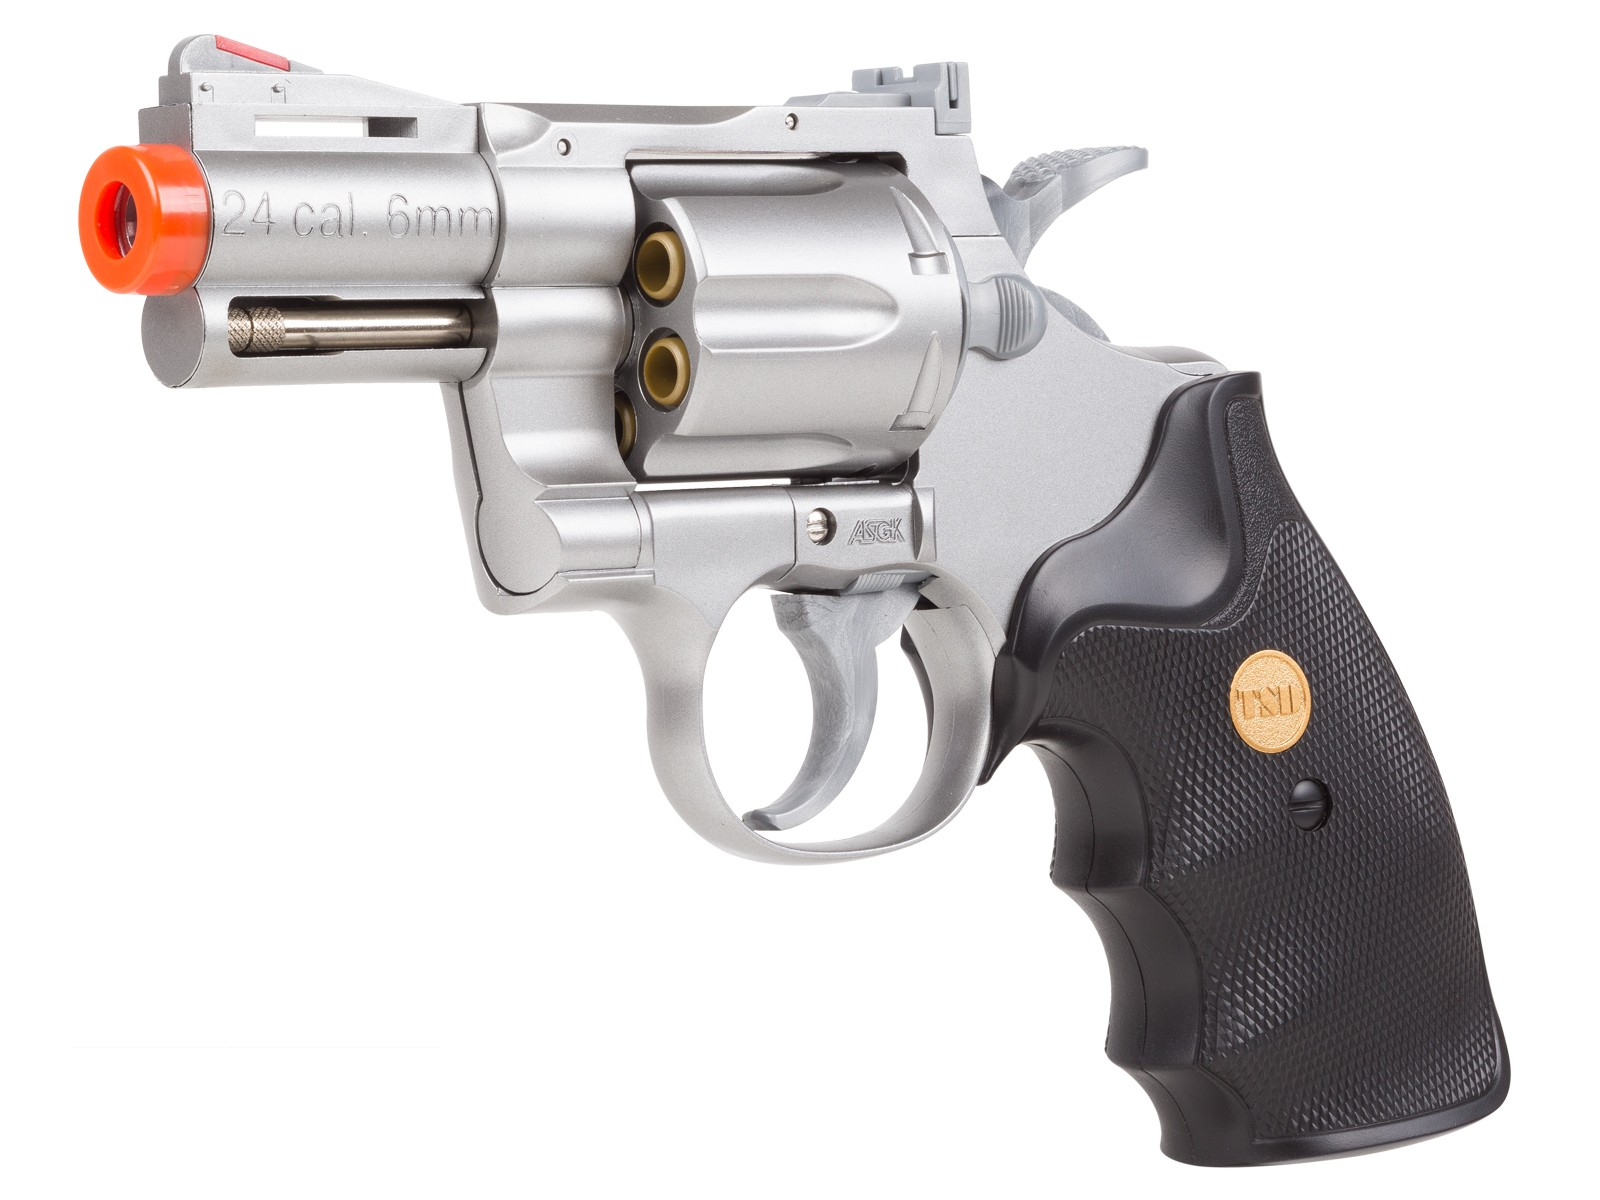 TSD_UHC_939_25_inch_barrel_revolver_SilverBlack_6mm